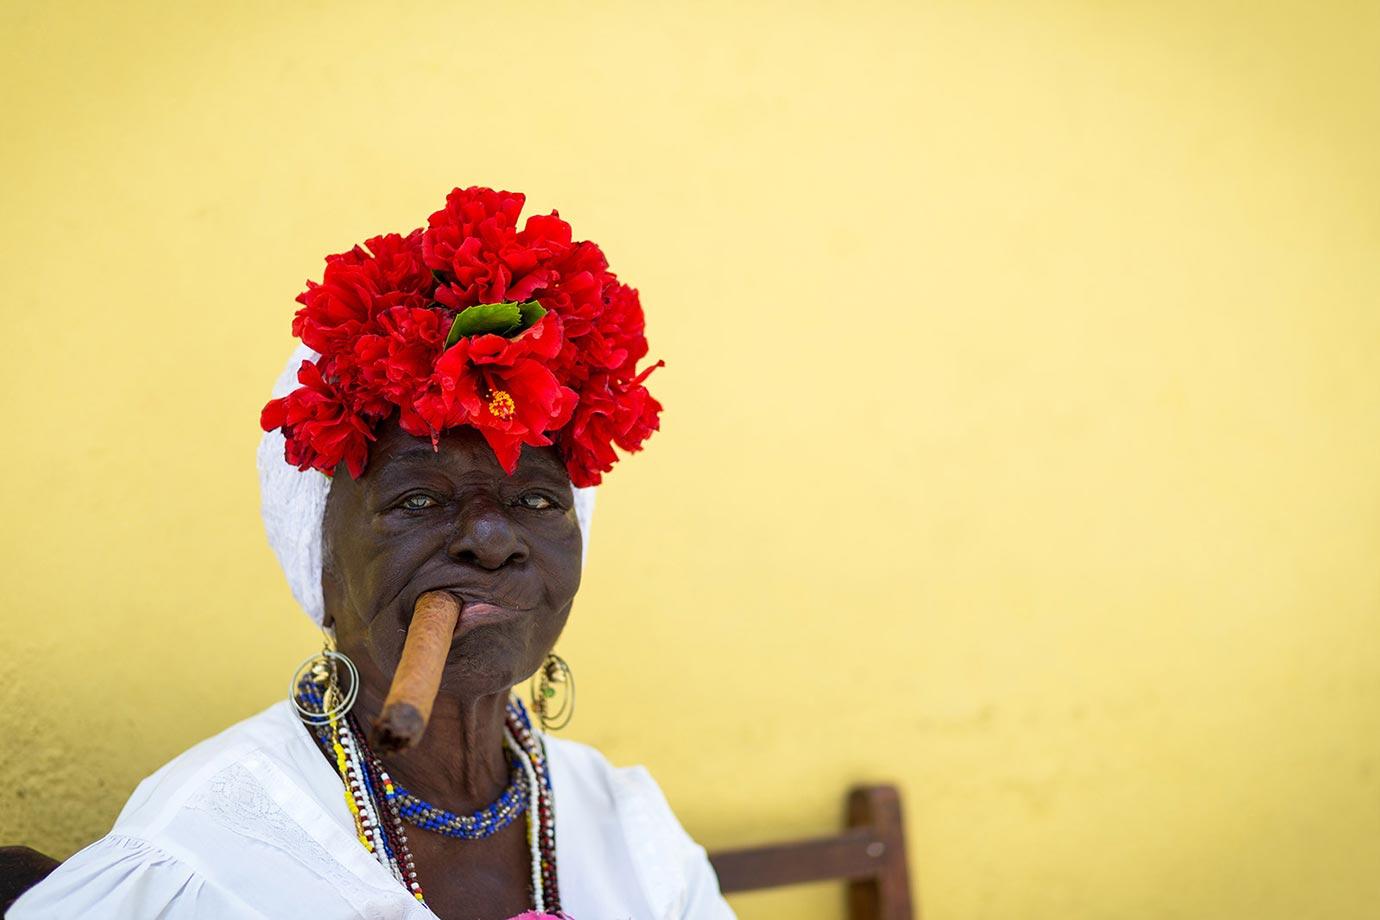 cuba people images